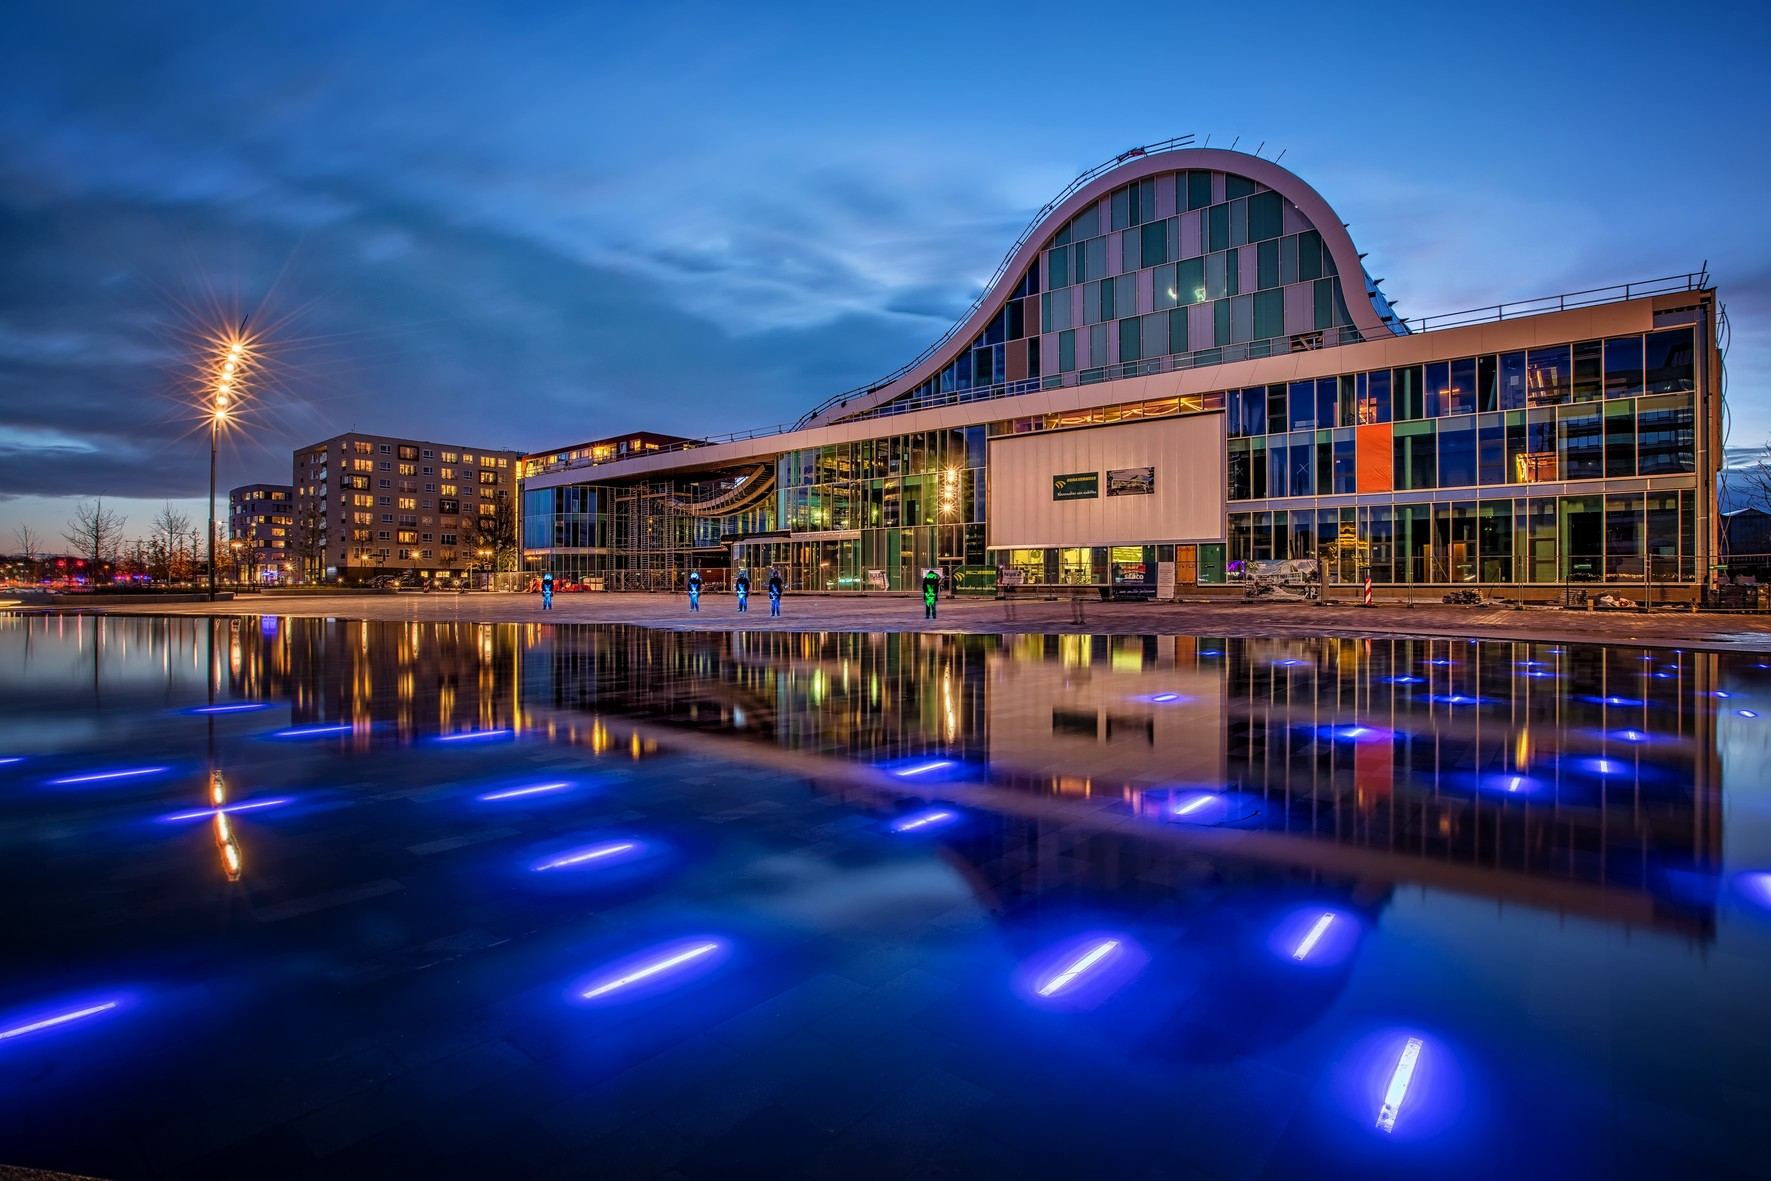 Atlas Theatre by night.jpg